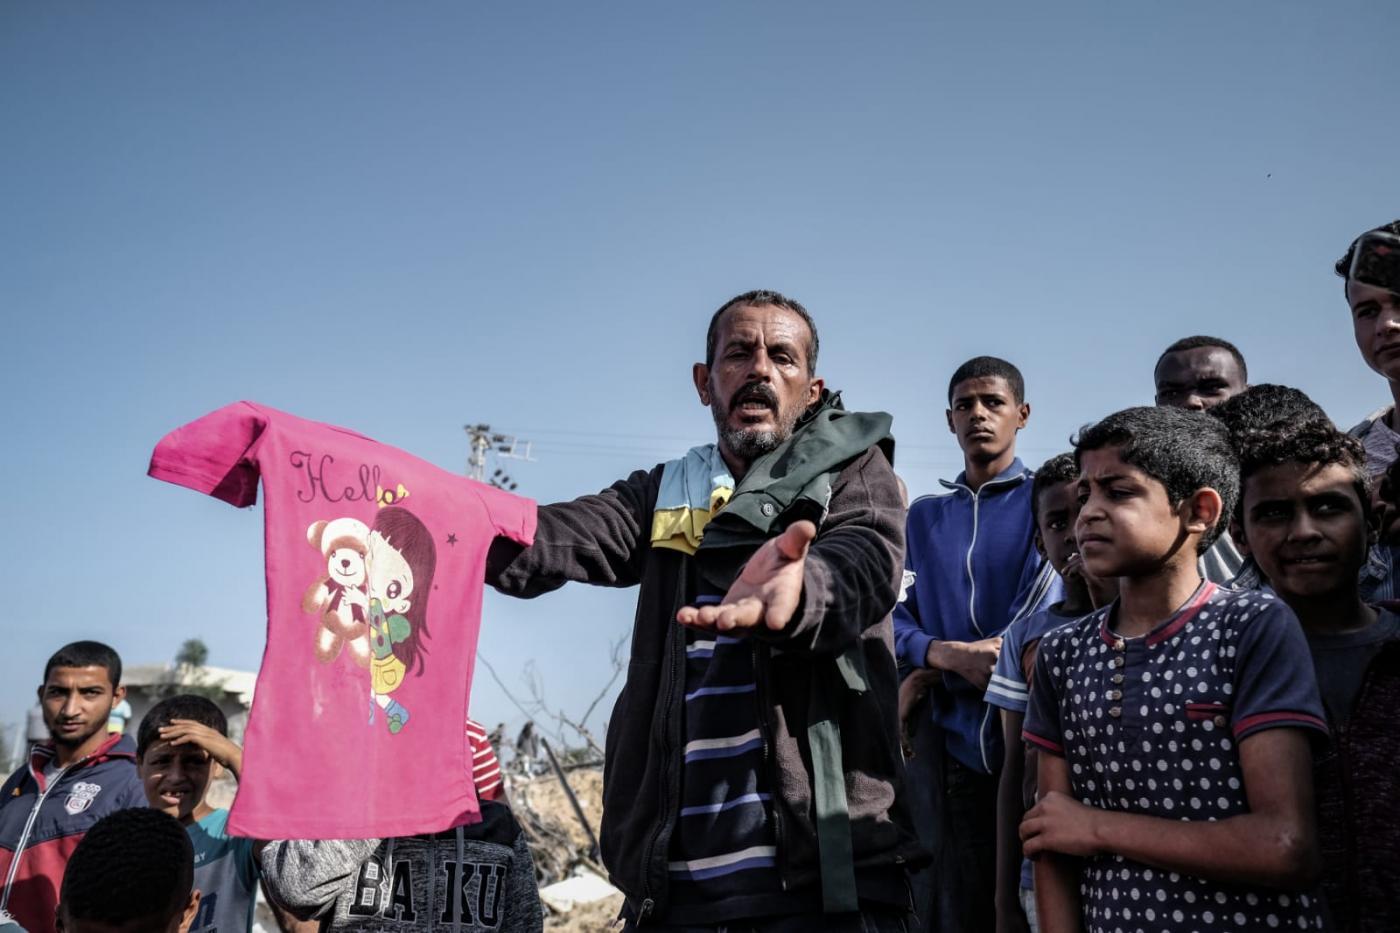 Bantai Keluarga Al-Sawarka, Israel: Kami Mengira Rumah Itu Kosong